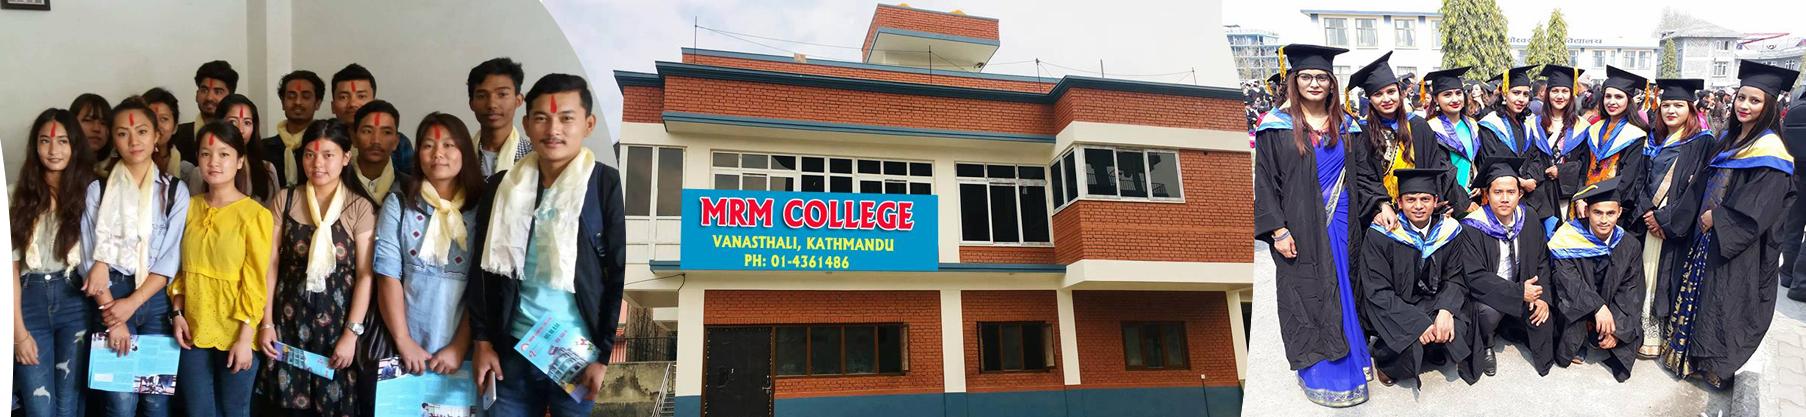 MRM College